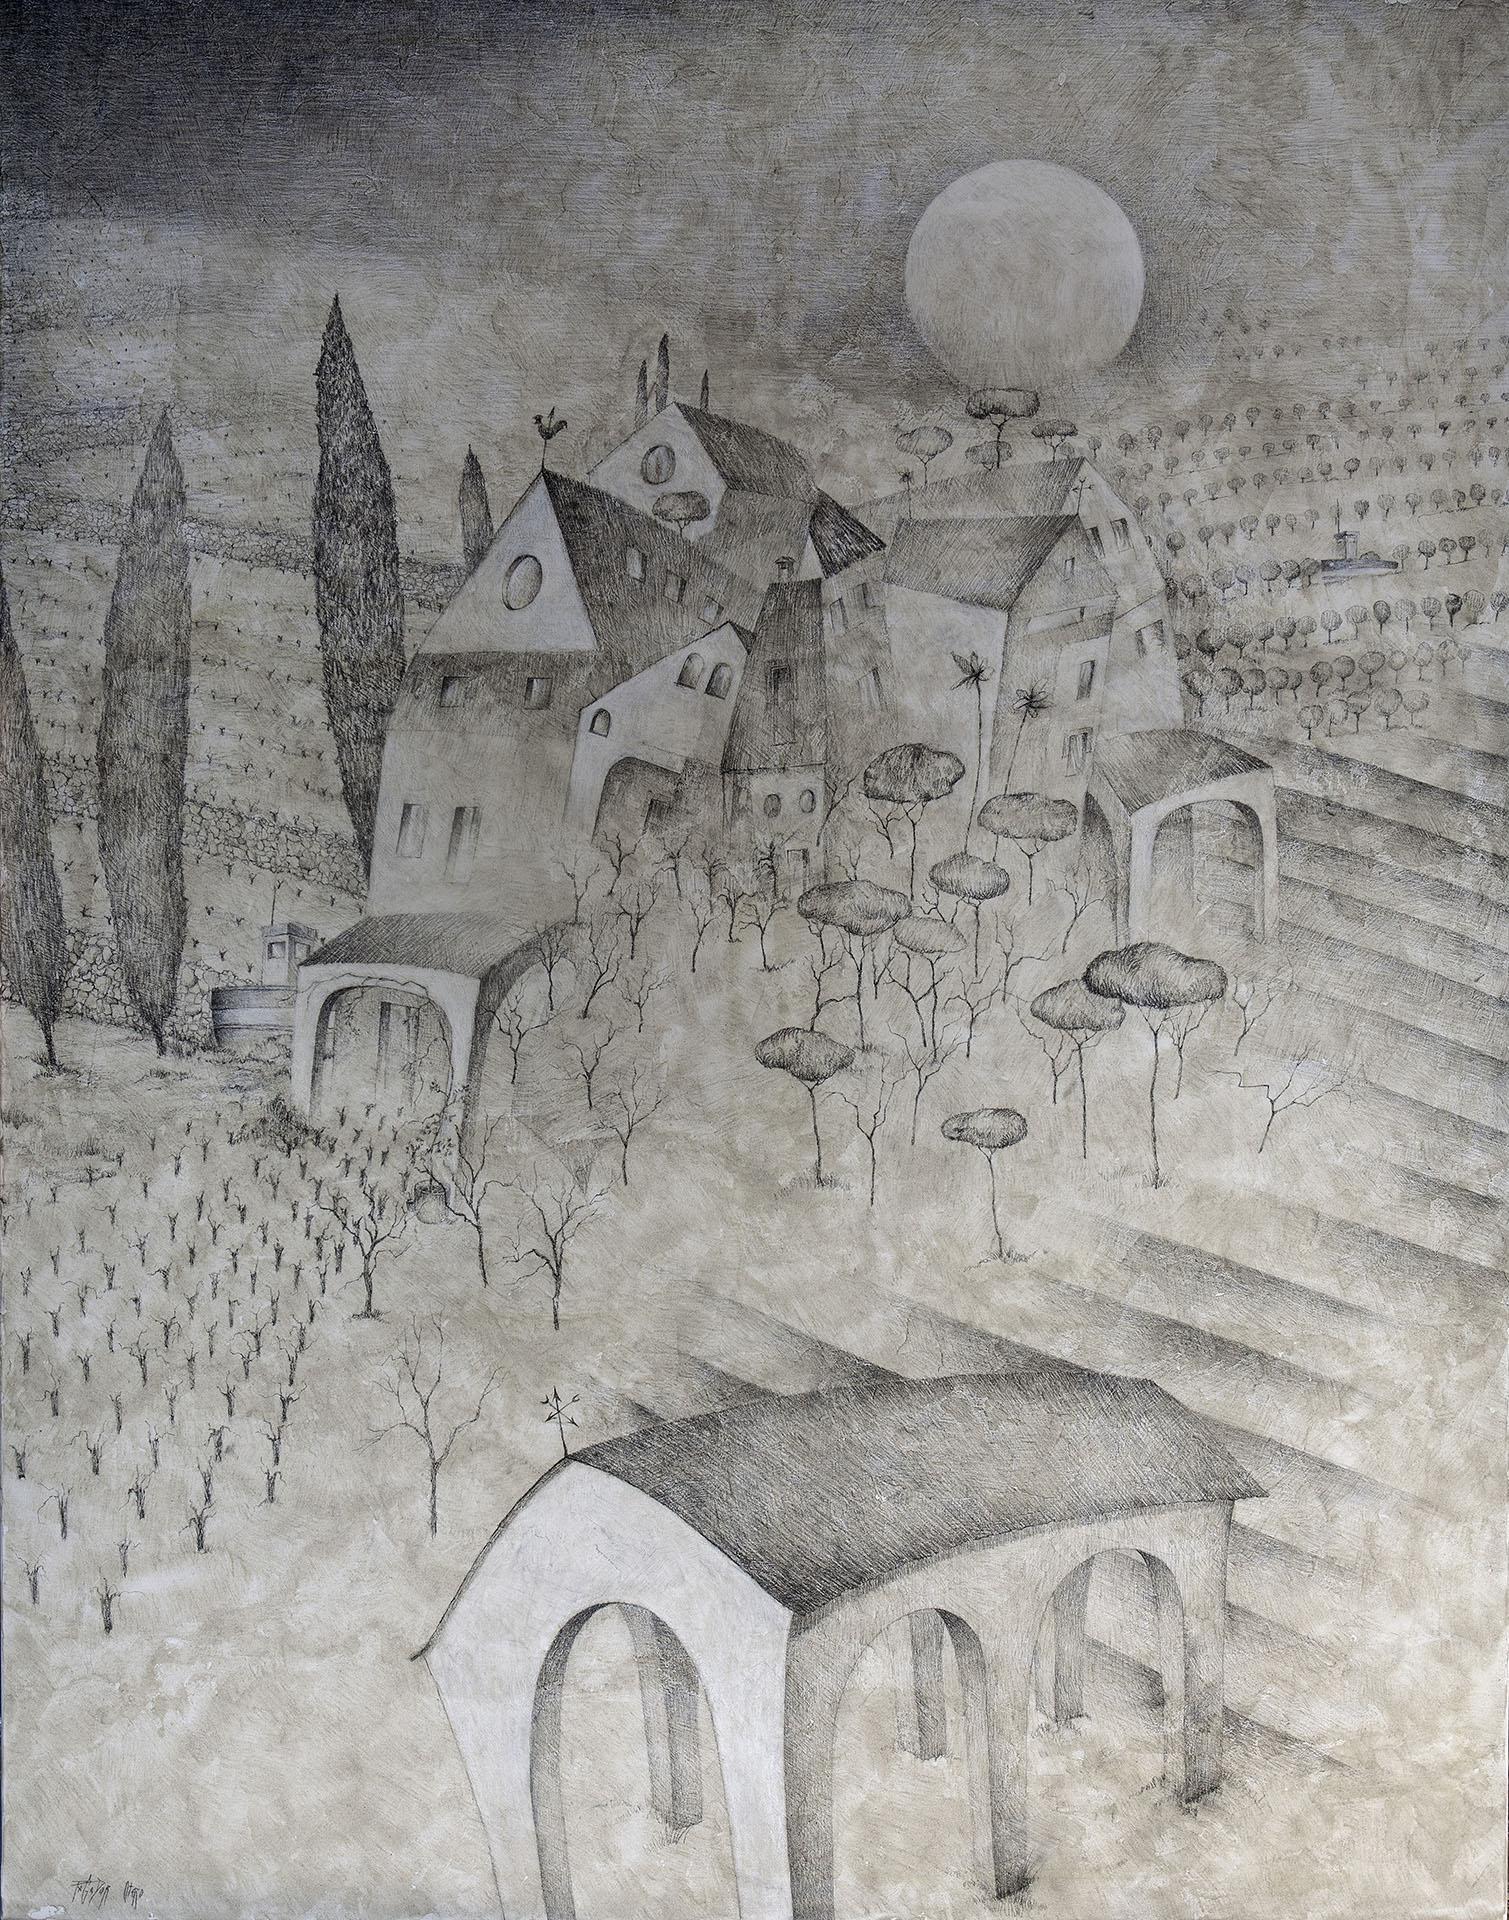 """MARINA ALTA II""  Grafito y Tiza S/Lienzo  154x120 cm. 2019 Gata de Gorgos"